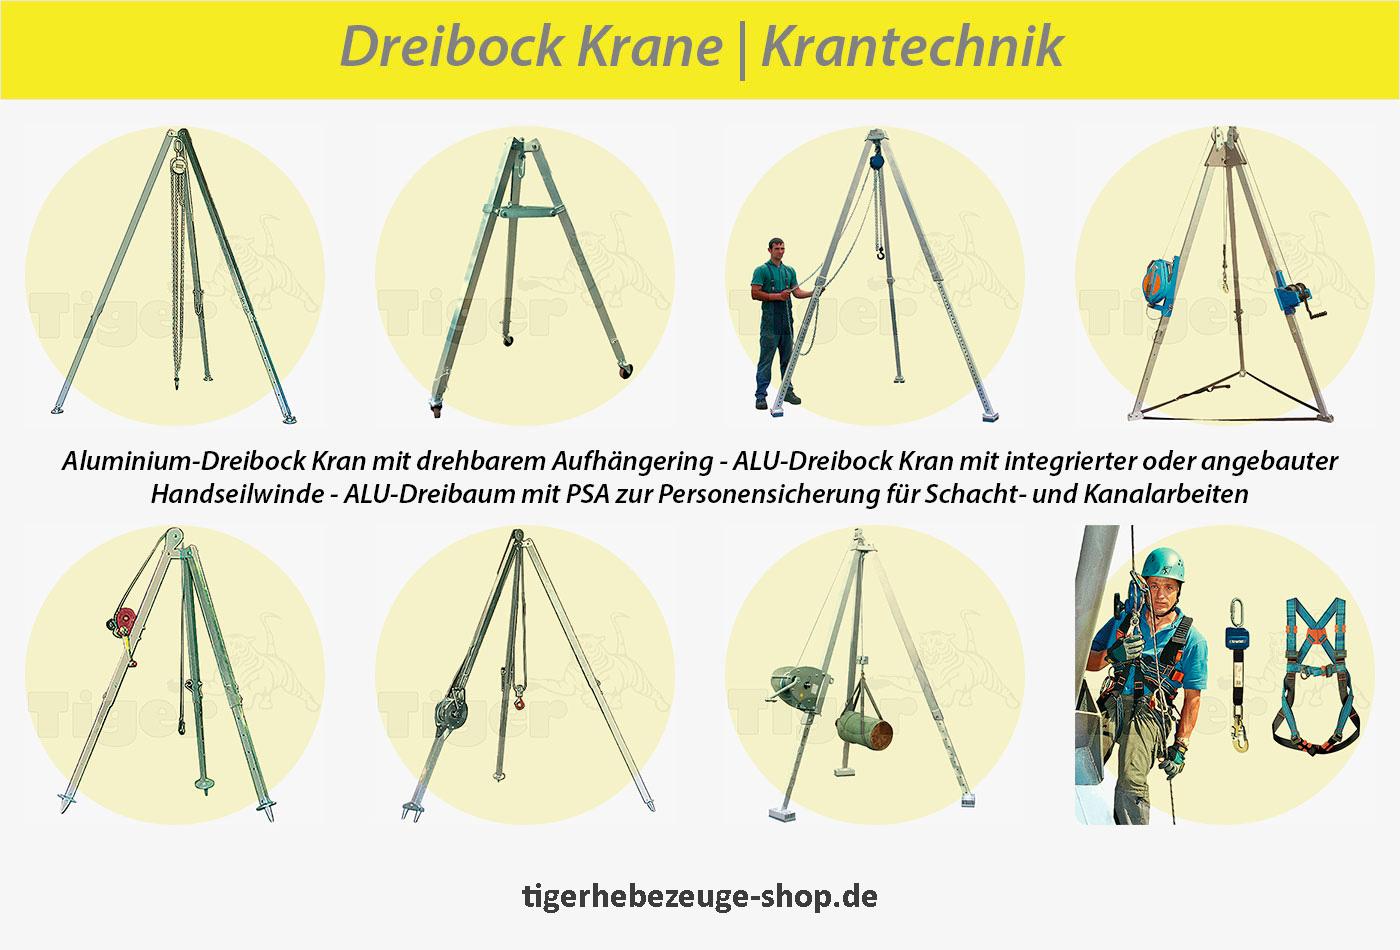 Dreibock Krane